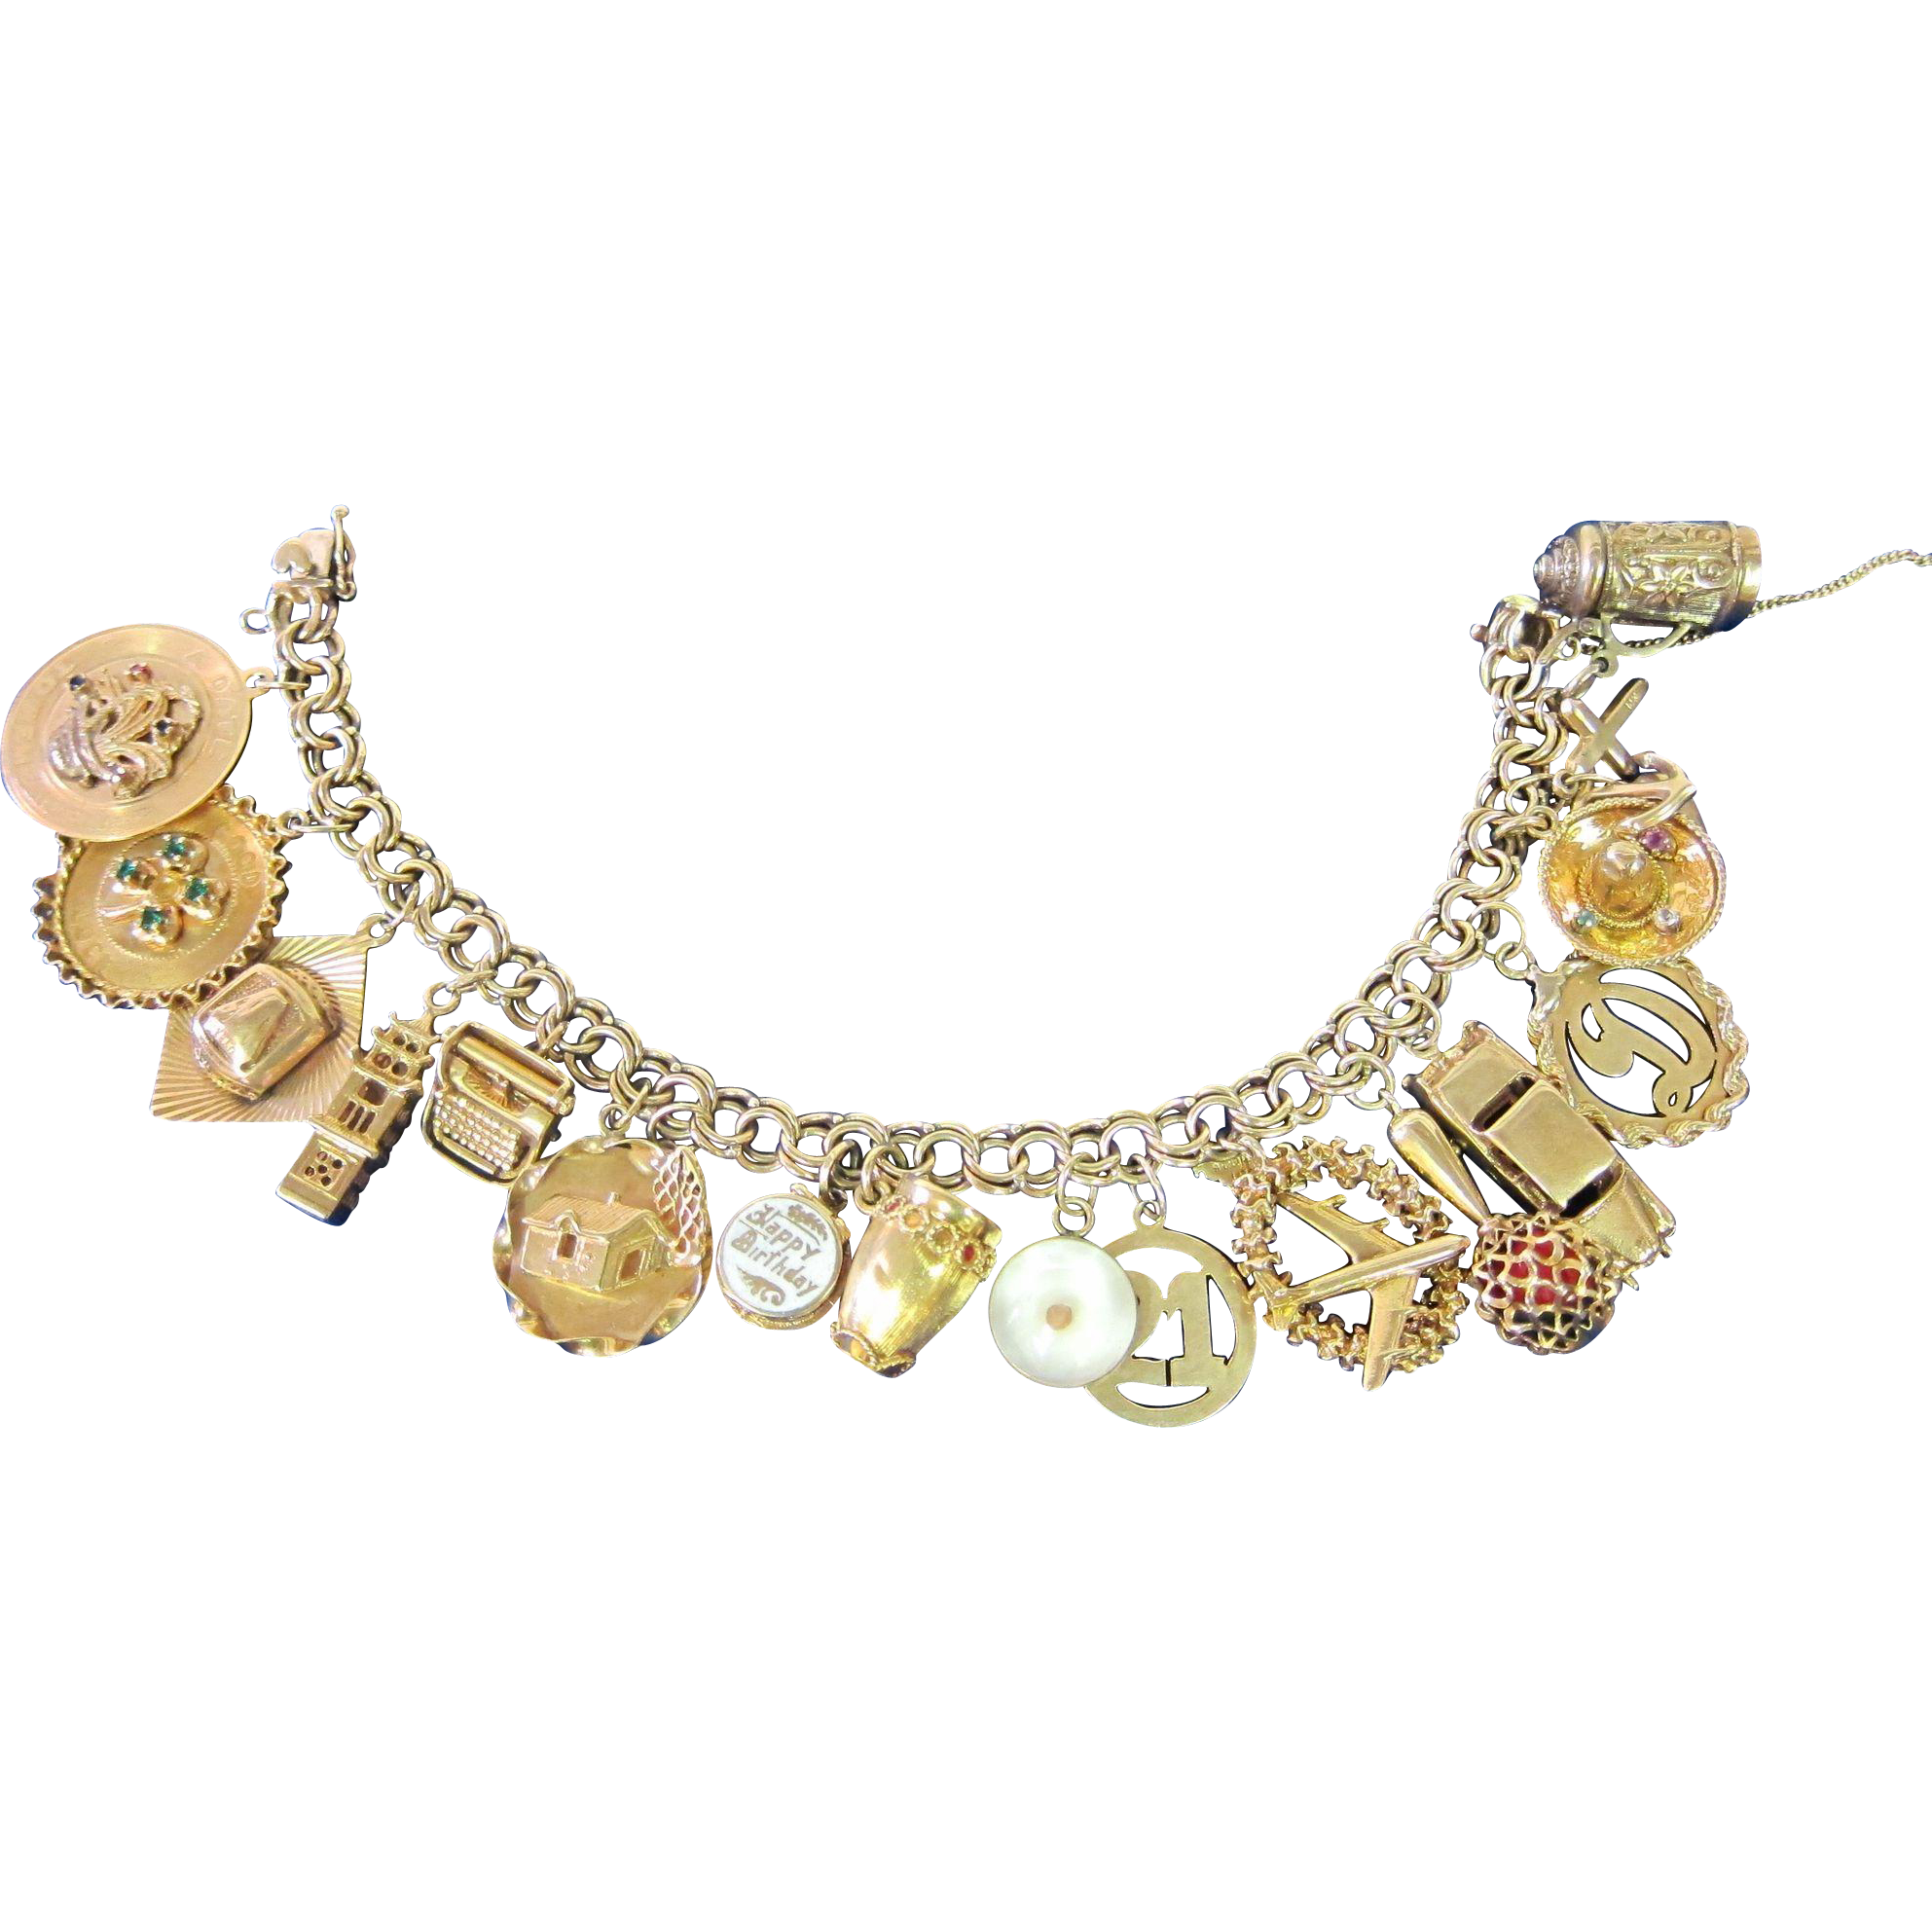 Vintage 14k Gold Charm Bracelet, Circa 1960's